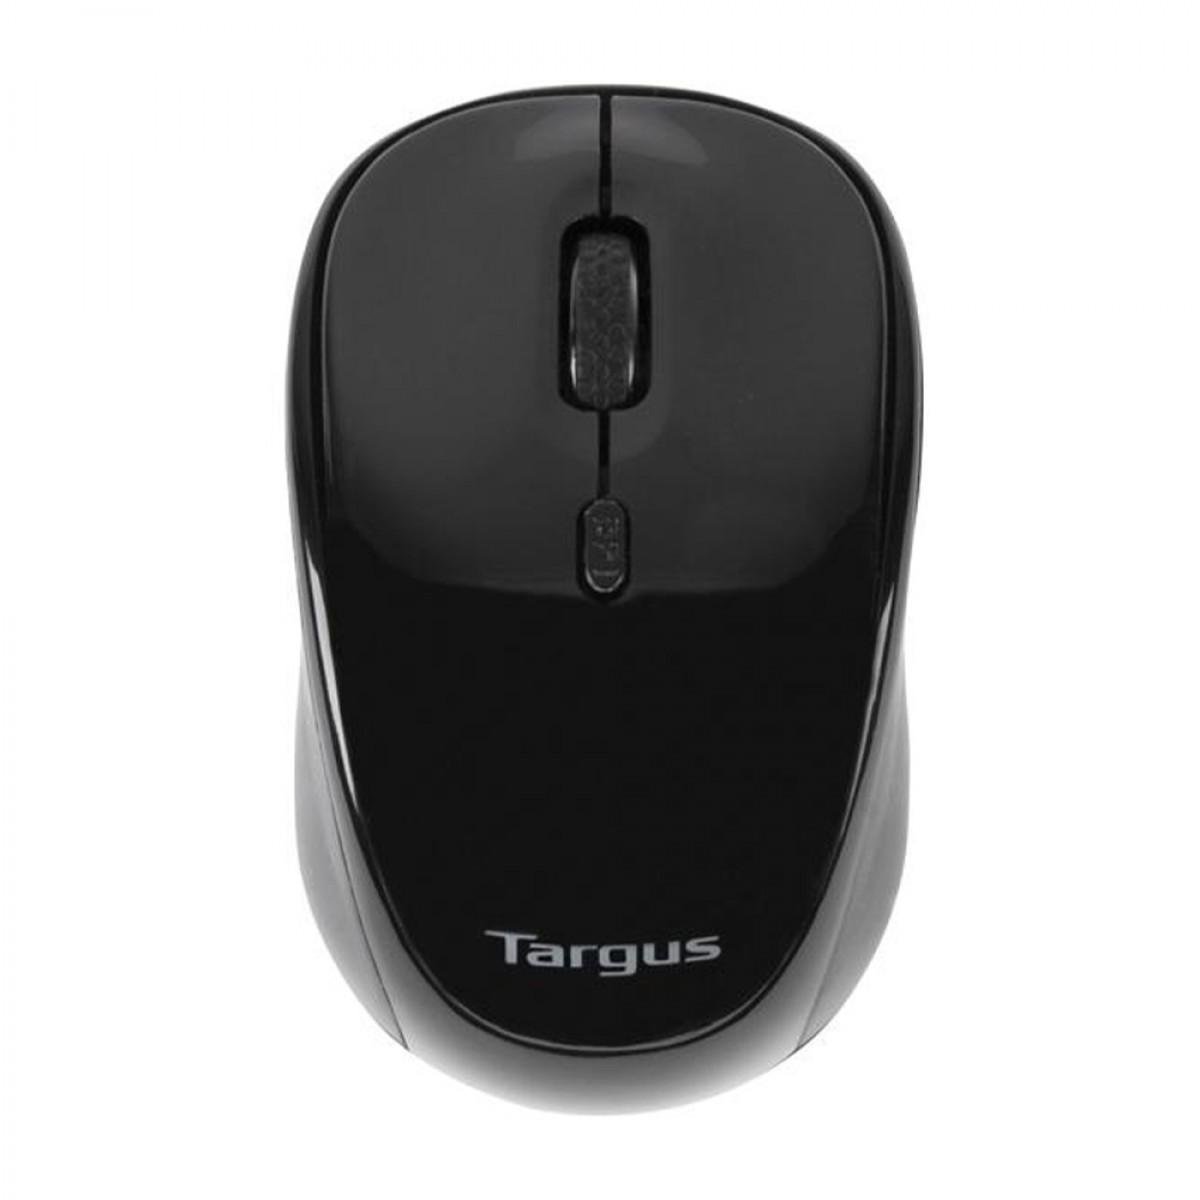 Targus W620 Wireless 4-Key Optical Mouse - VEVE